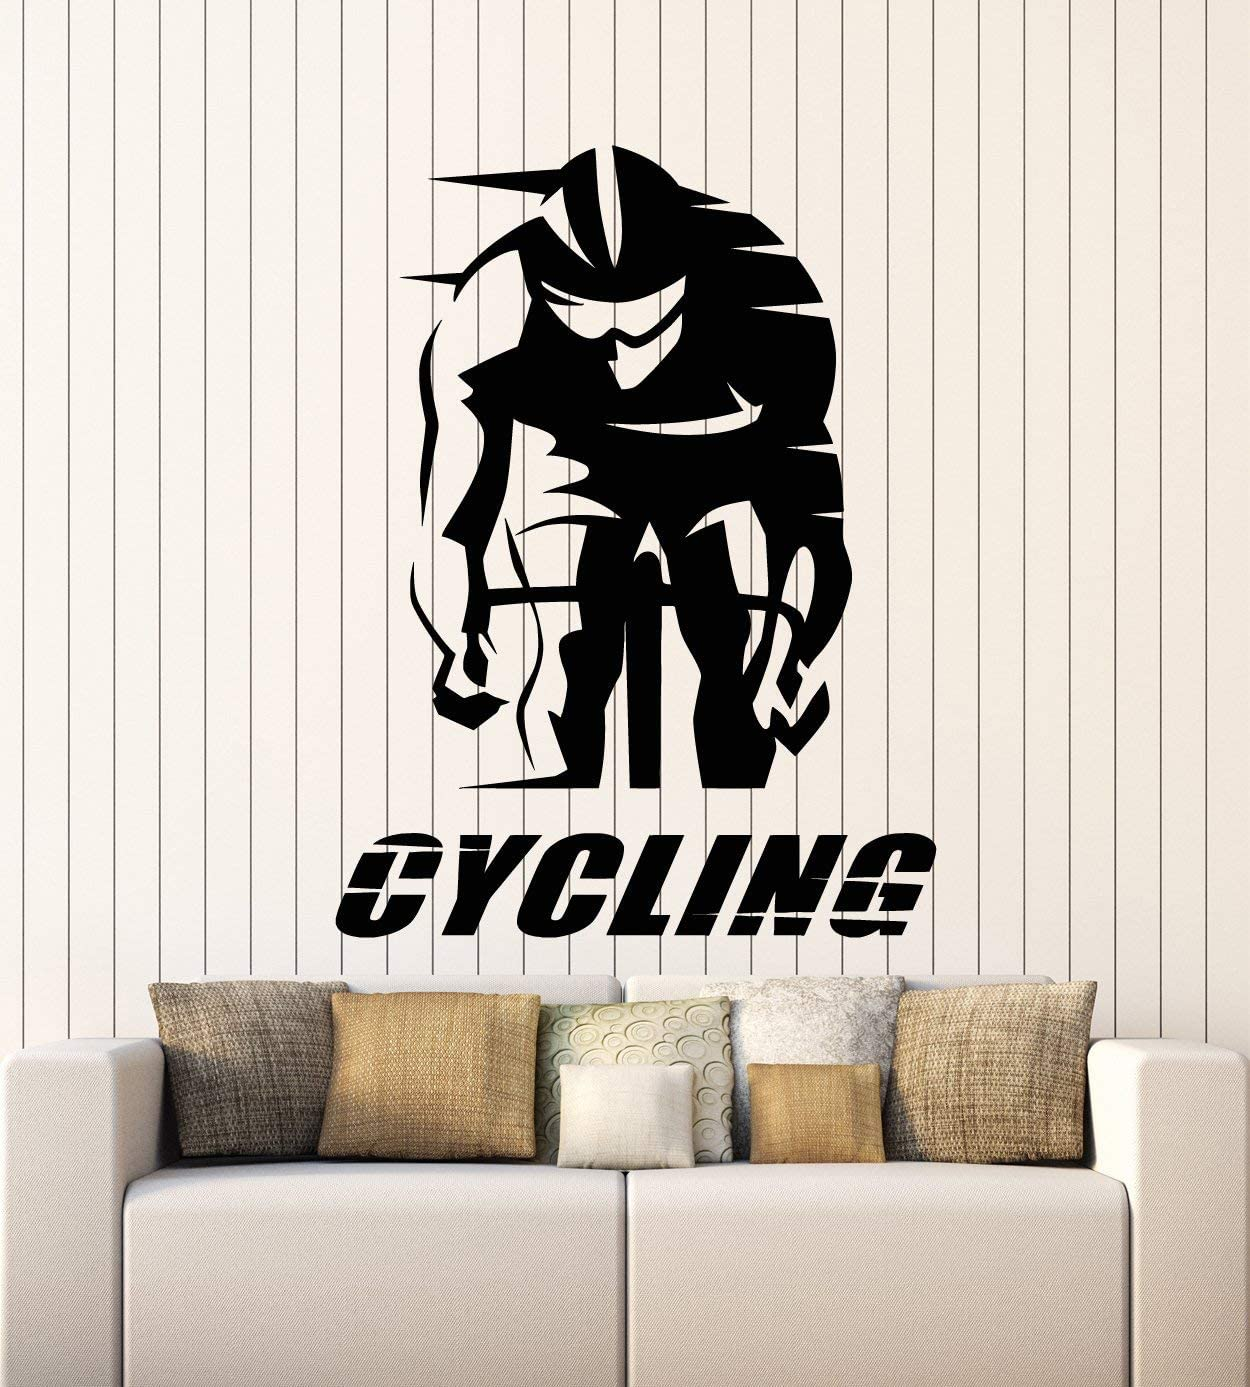 DesignToRefine Vinyl Wall Decal Cycling Words Cyclist Race Bike Sport Art Stickers Mural Large Decor (g1095) Black